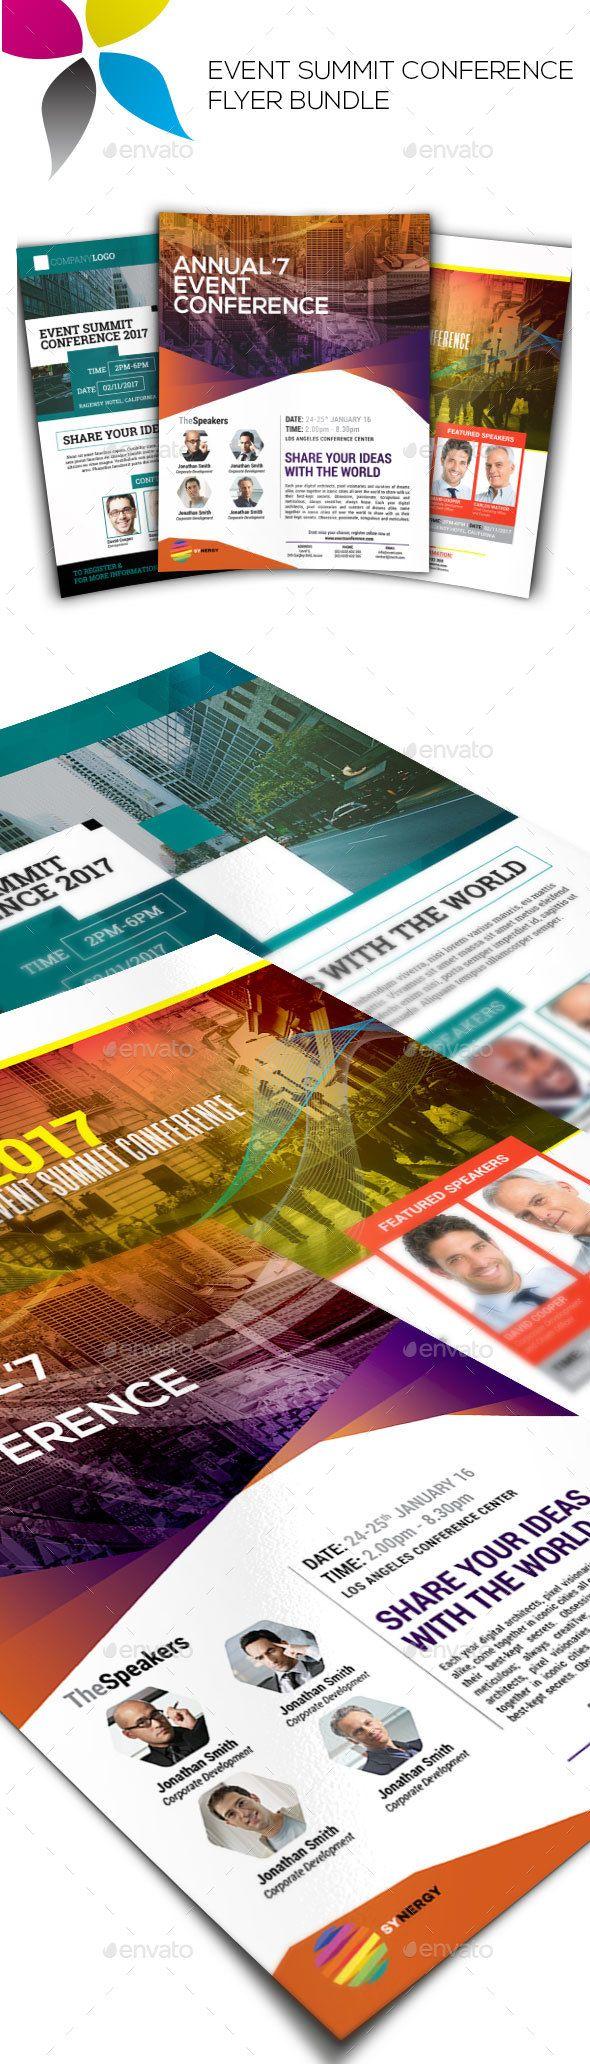 best ideas about flyer design templates flyer event summit conference flyer bundle vol 1